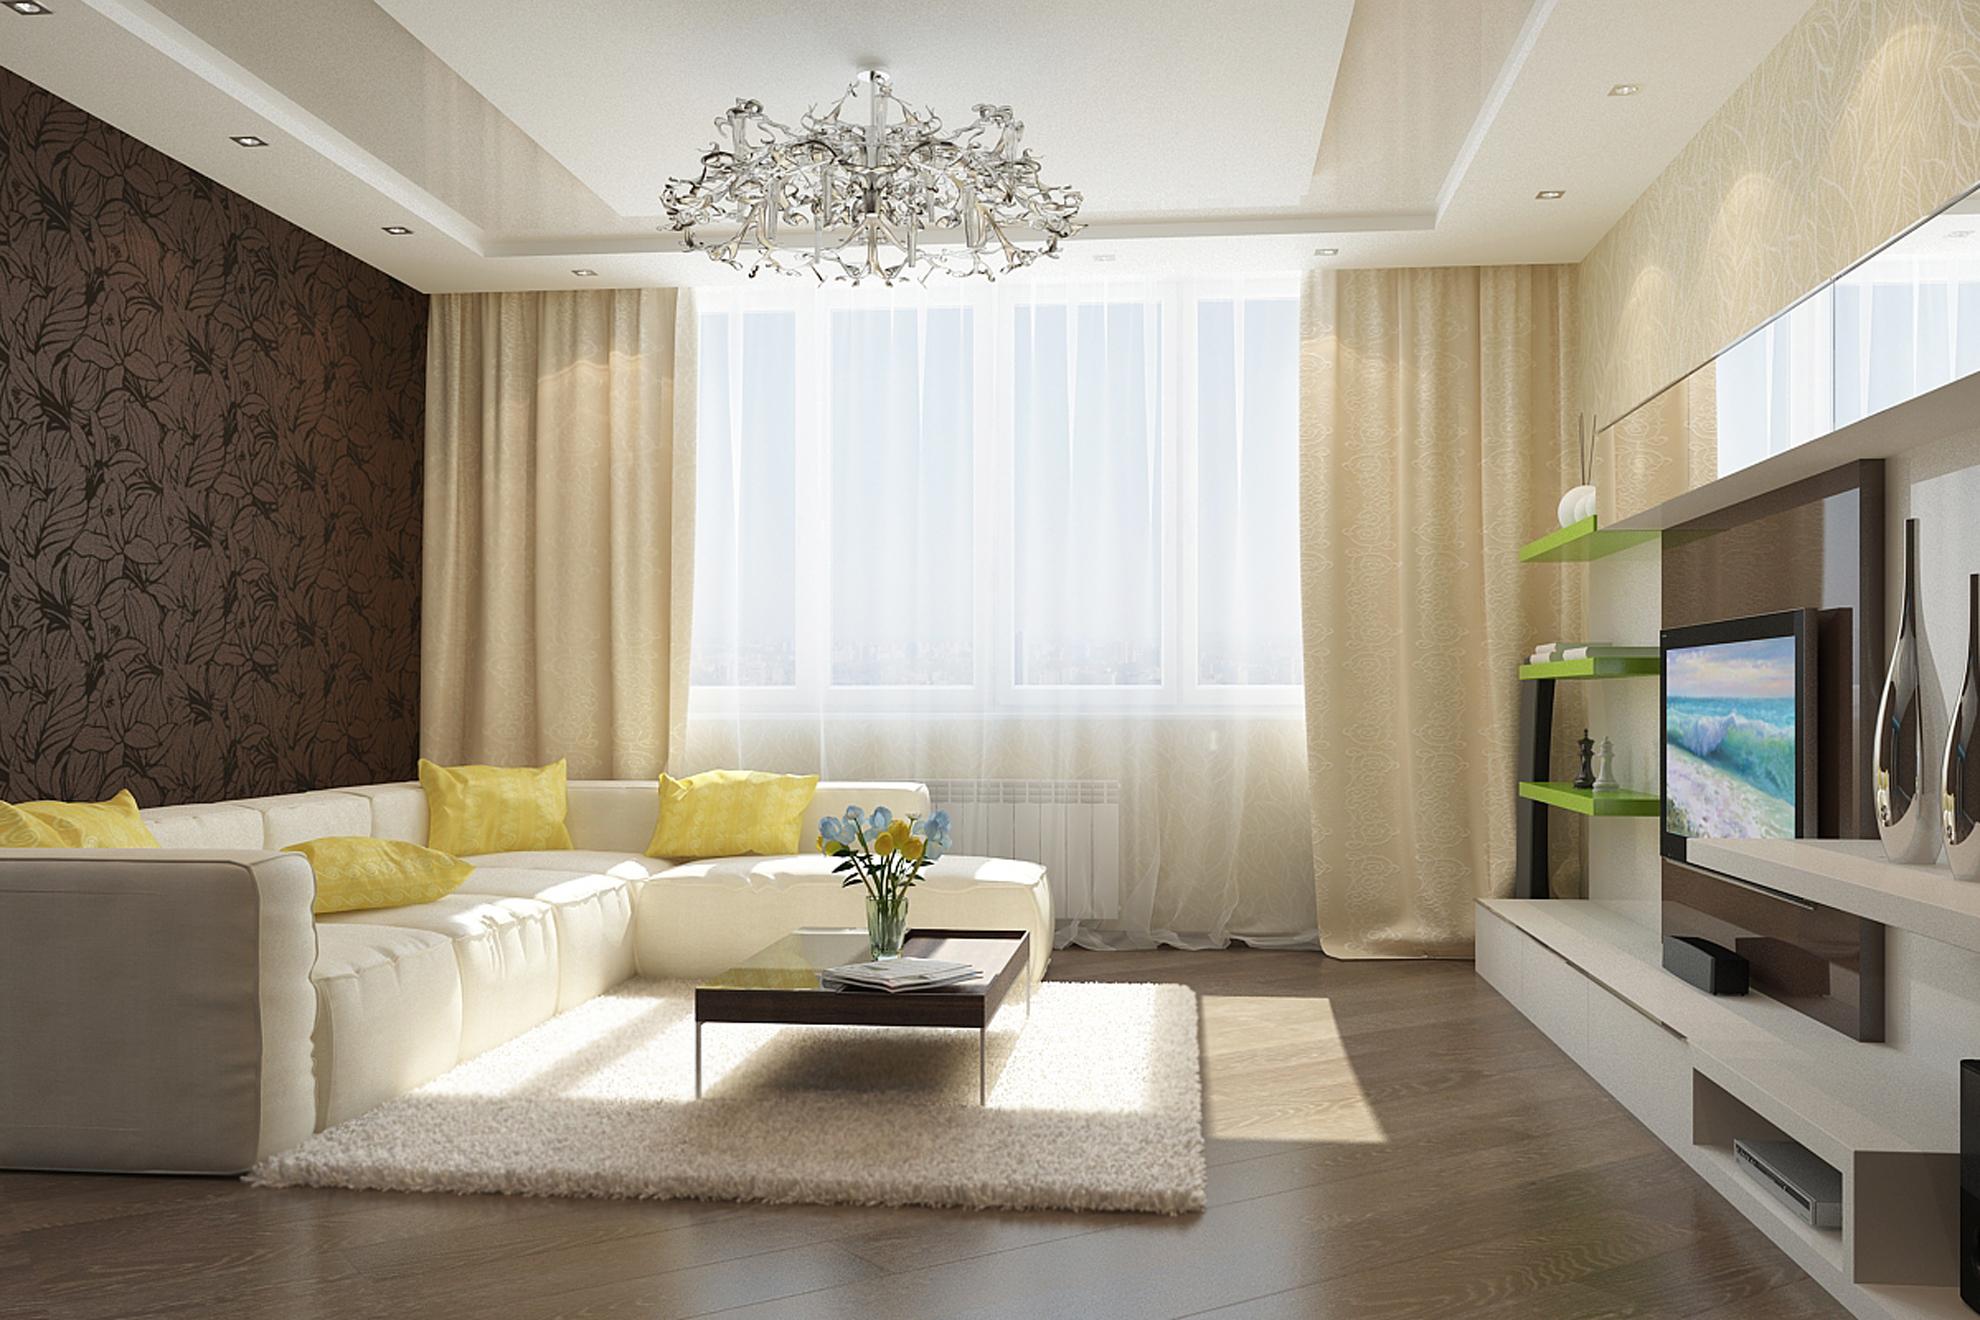 Фото Ремонт домов | Фото ремонта.ру - Фото дизайна ...